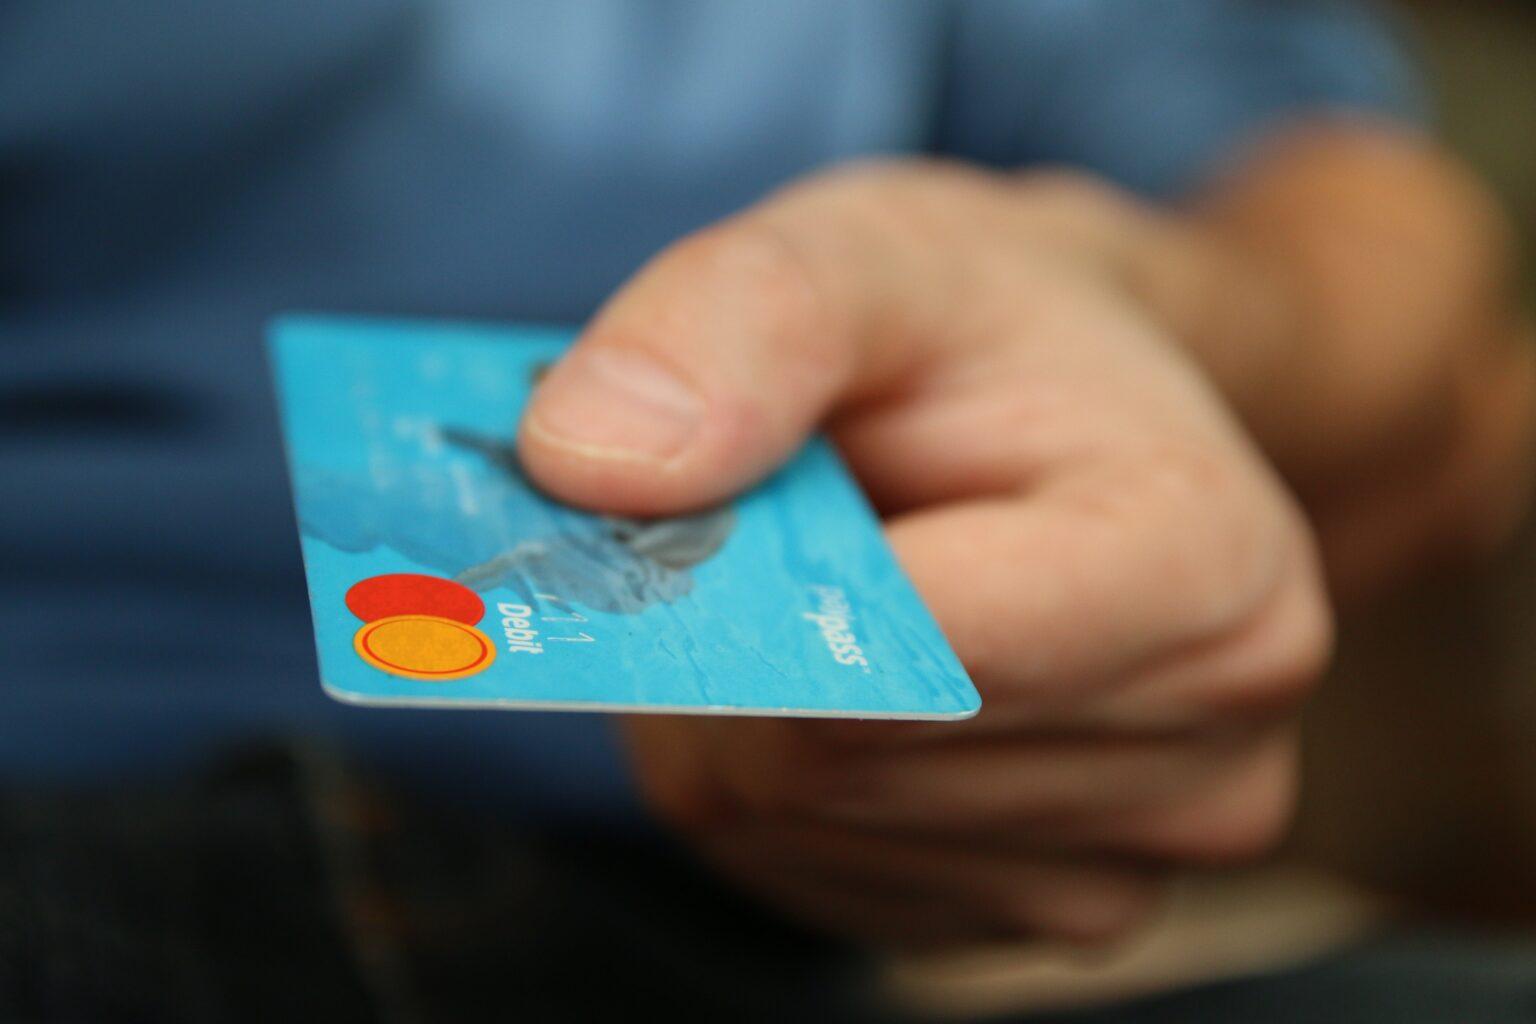 Contas de pagamento: entenda como funciona esse tipo de conta